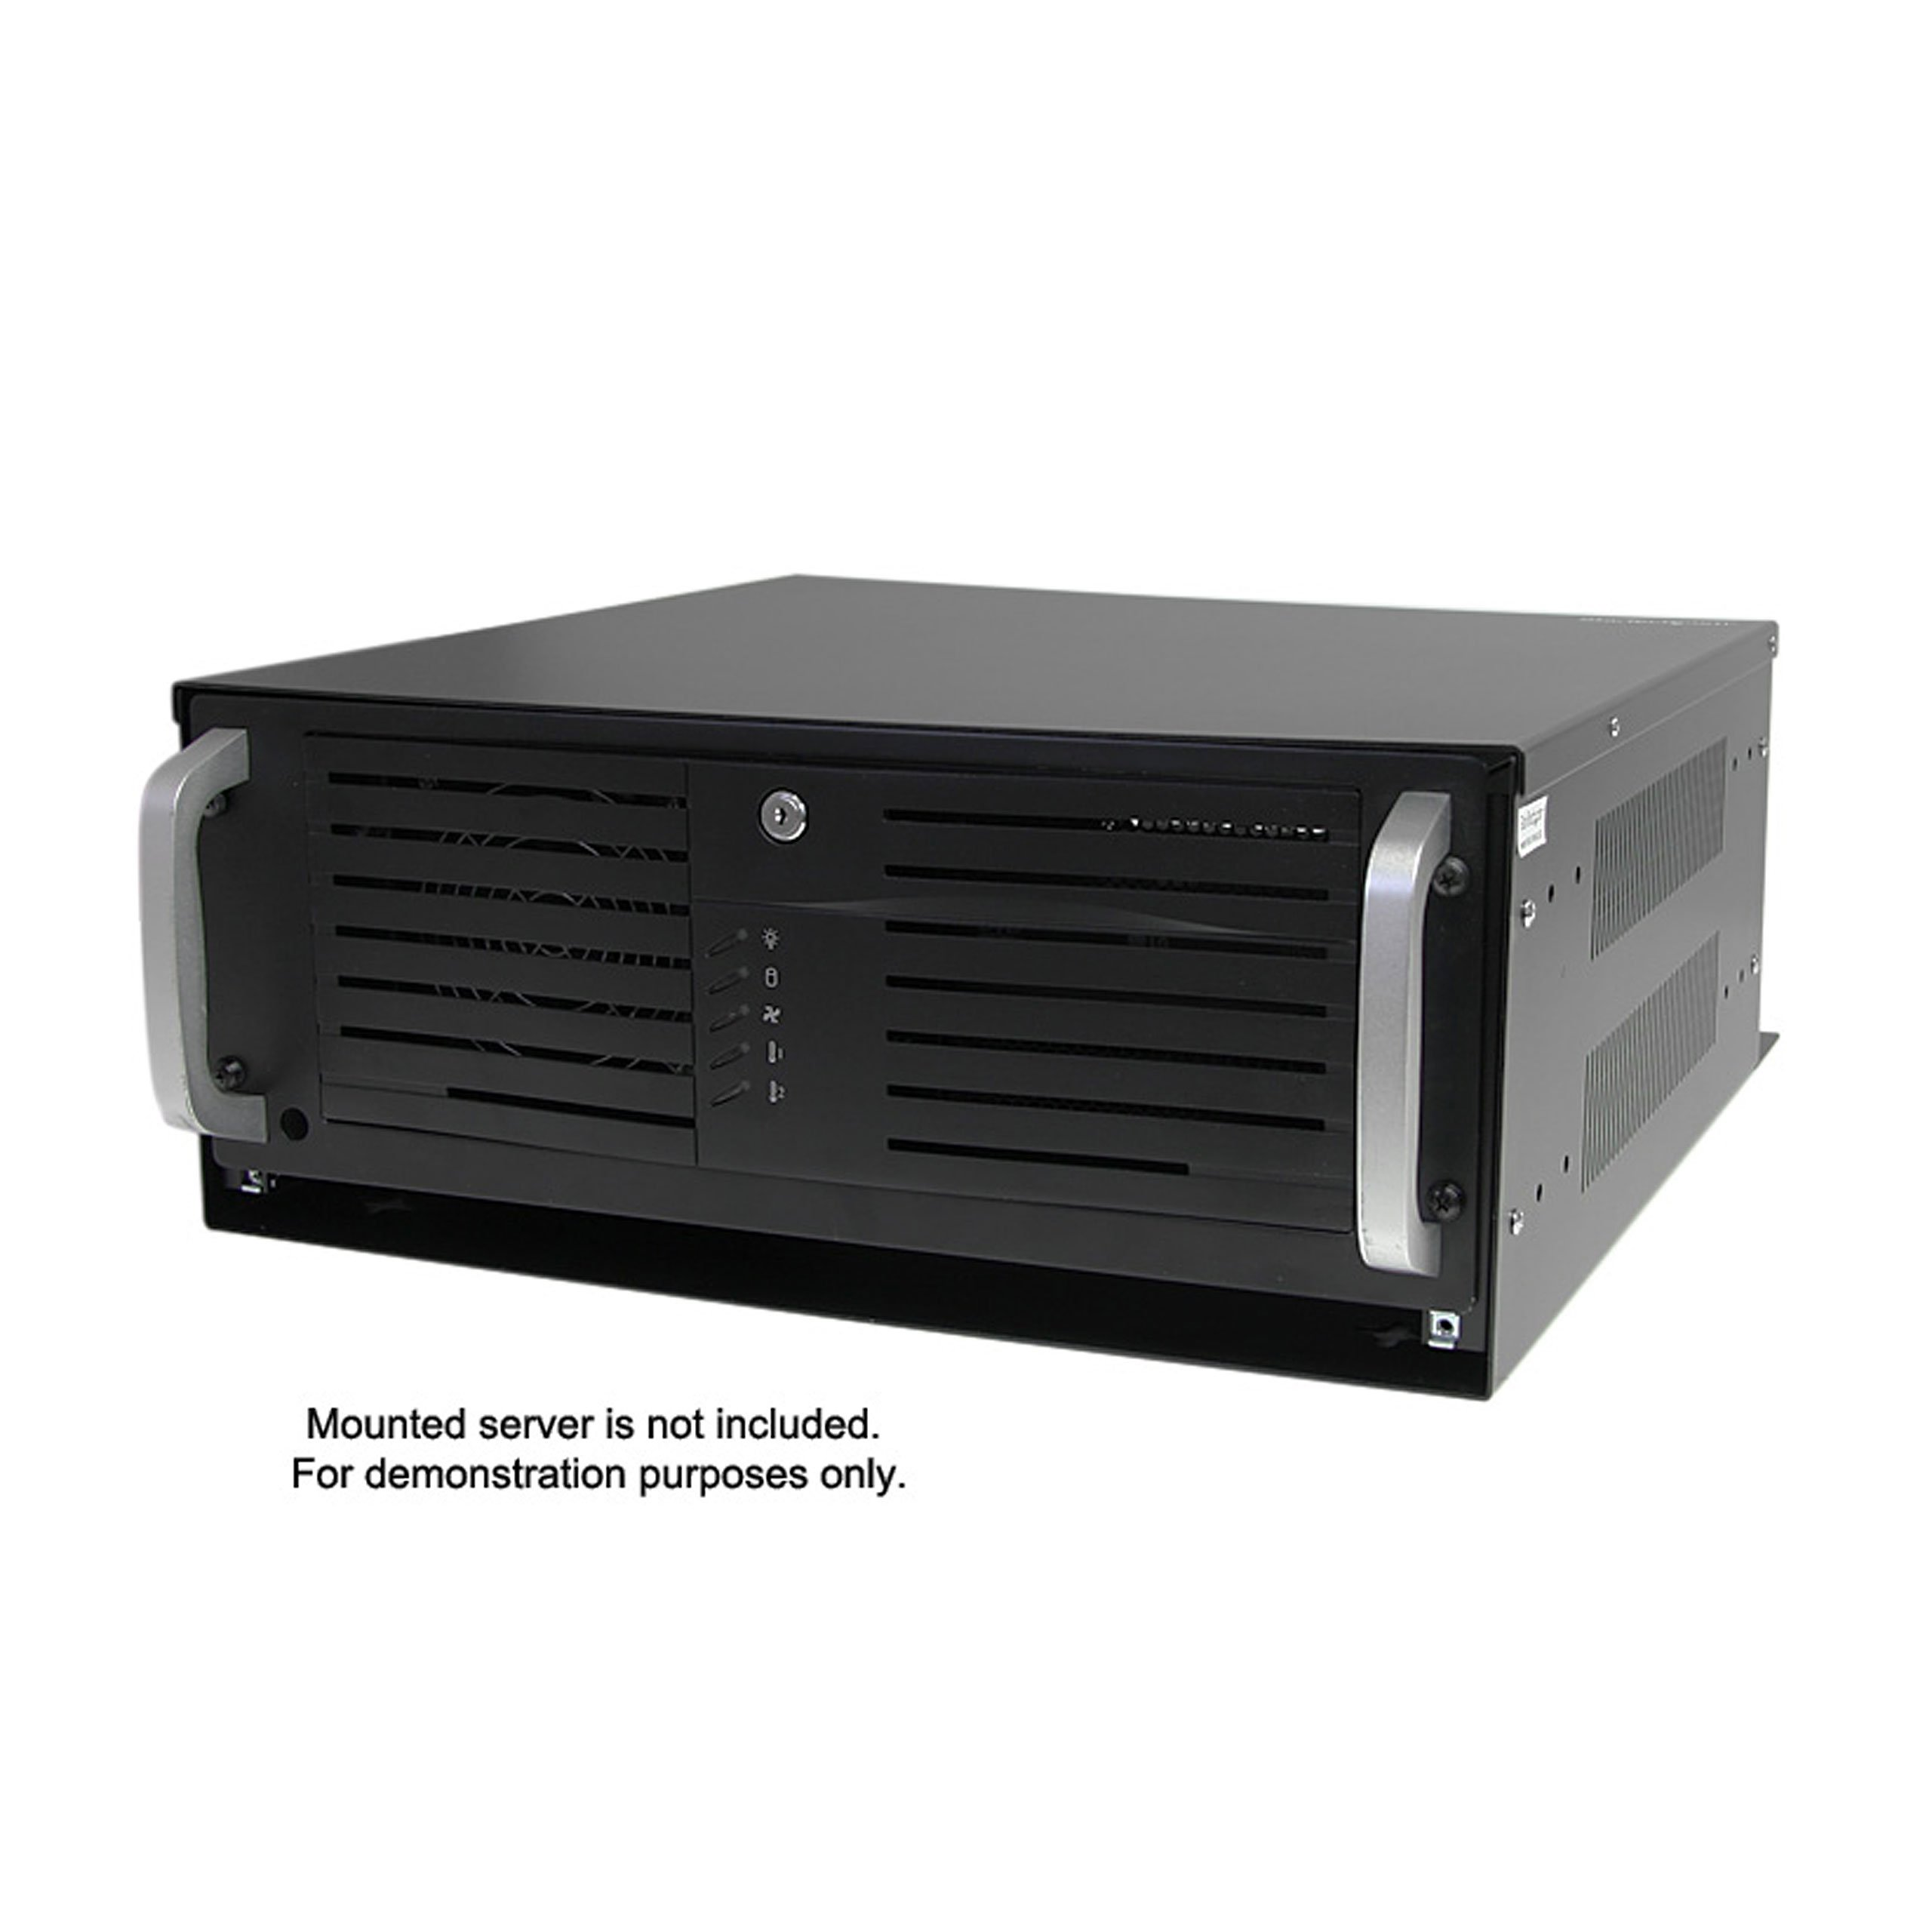 StarTech.com 4U 19-Inch Steel Horizontal Wall Mountable Server Rack RK419WALVO (Black) by StarTech (Image #5)